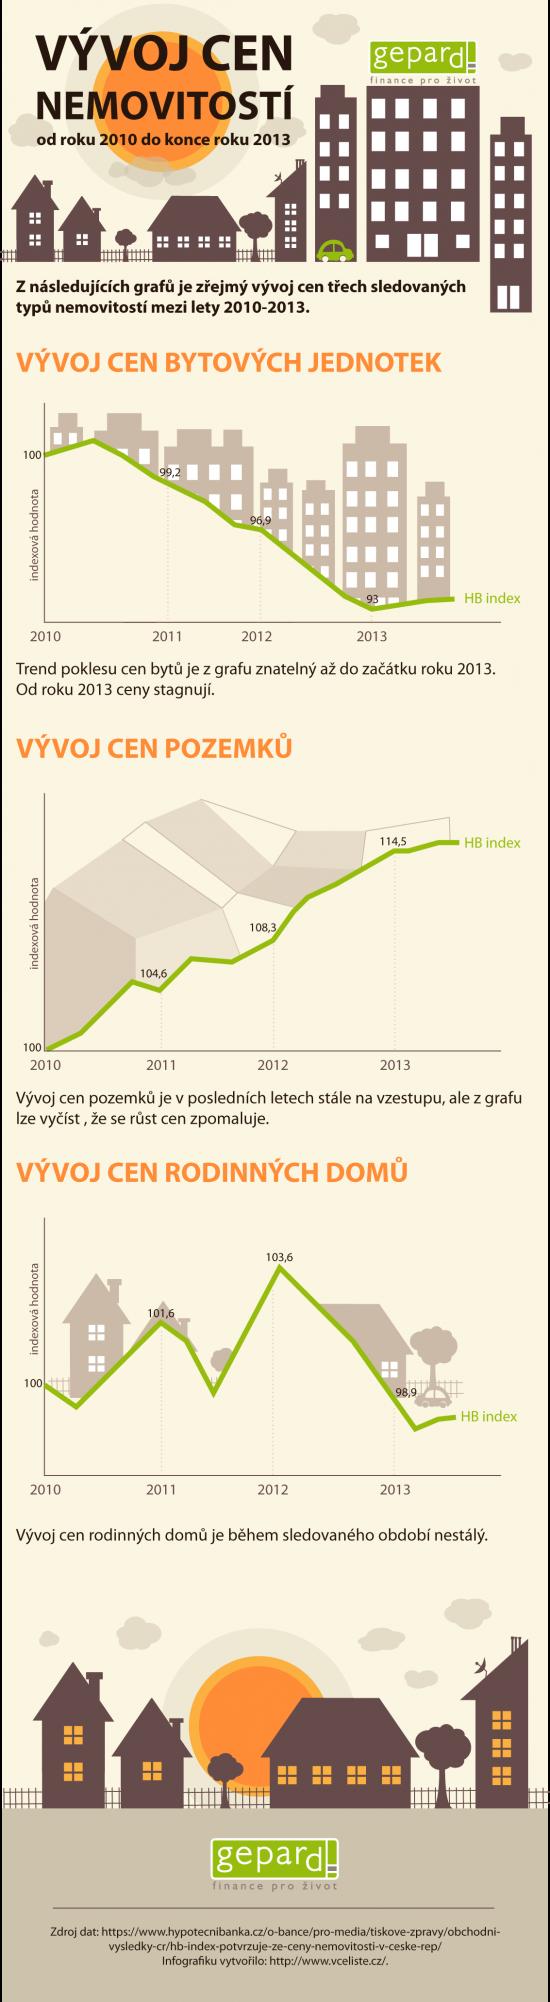 GPF - Vyvoj cen nemovitosti - infografika